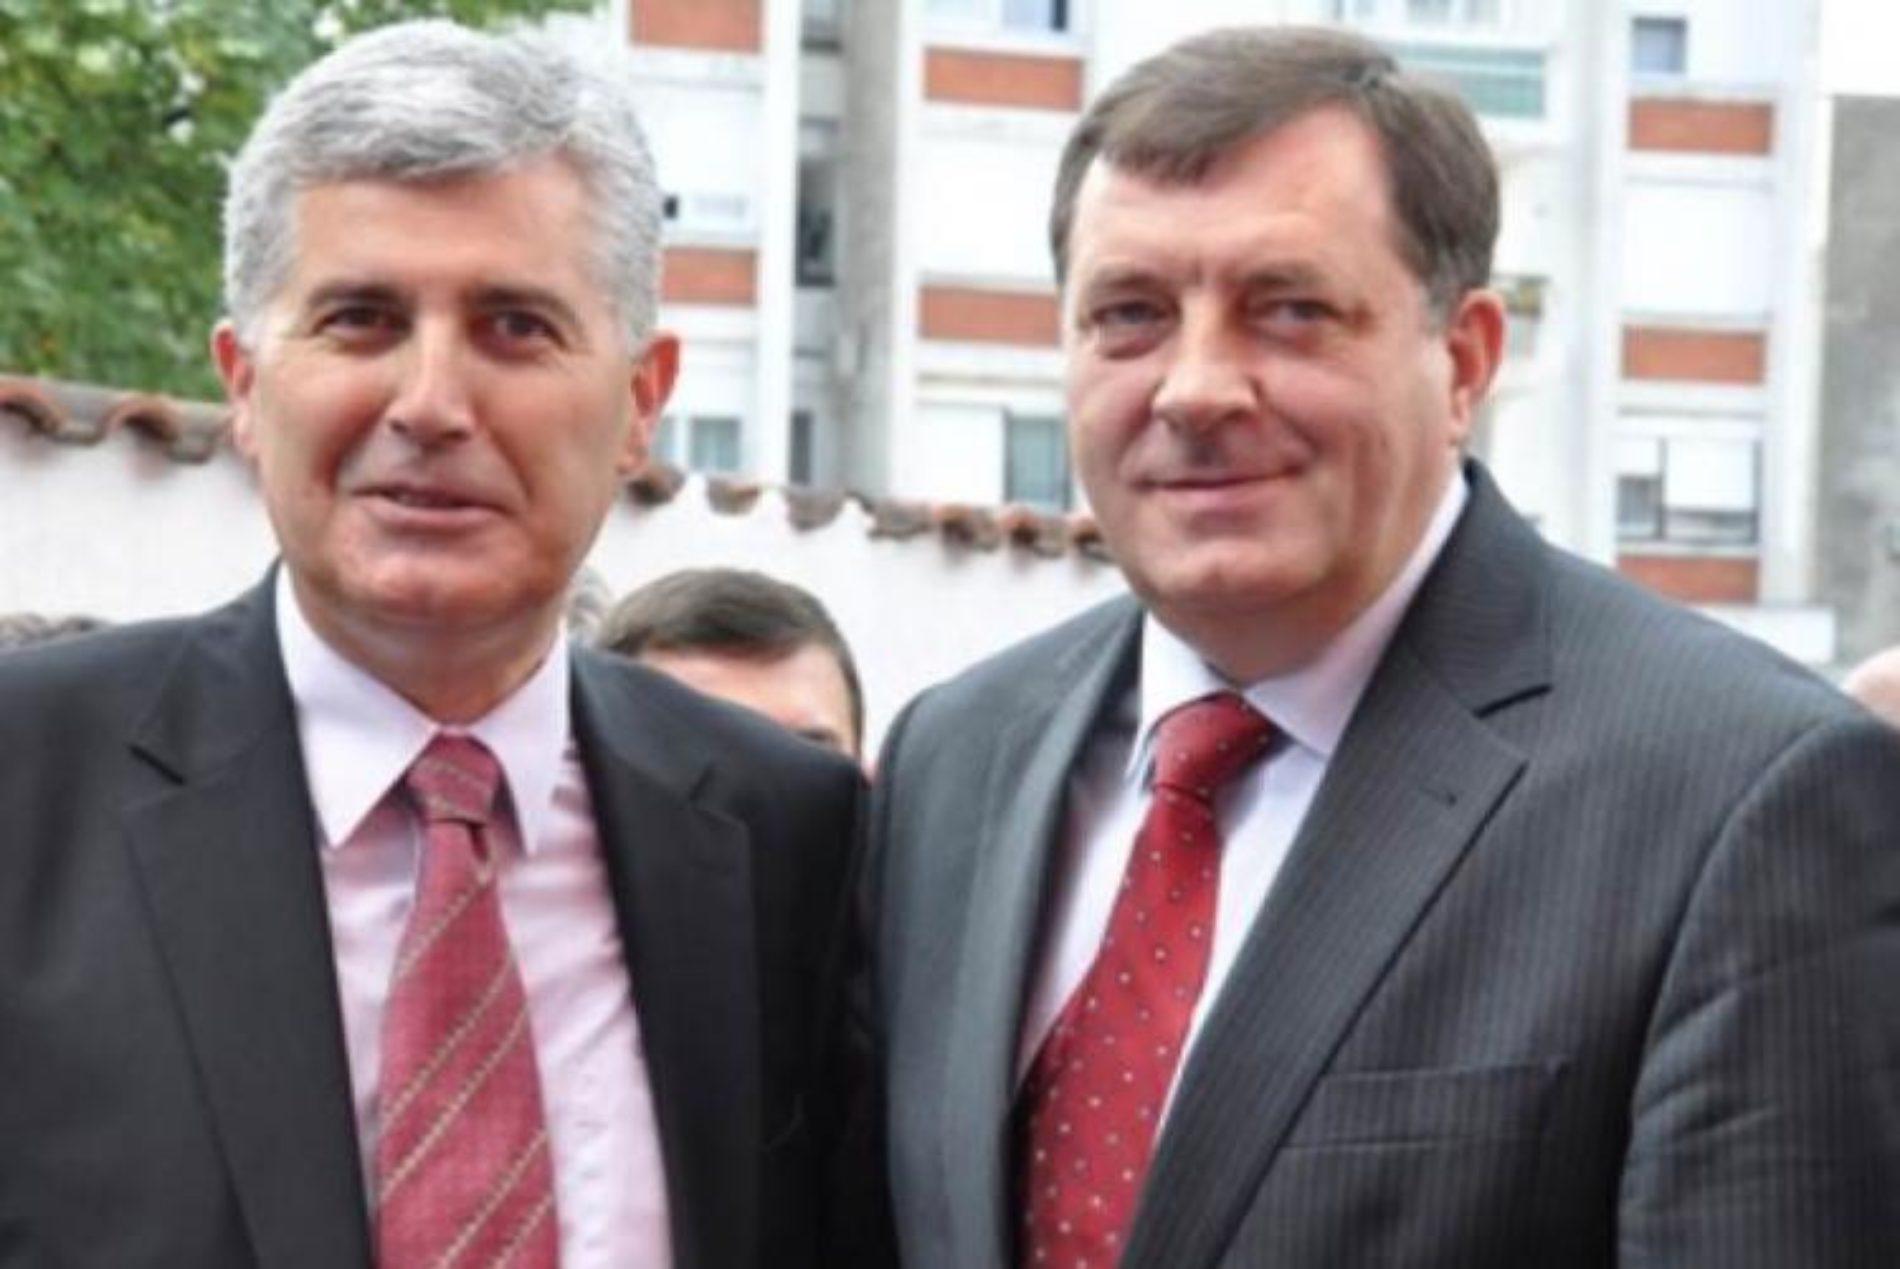 Partneri Dodik i Čović se protive reviziji tužbe protiv Srbije